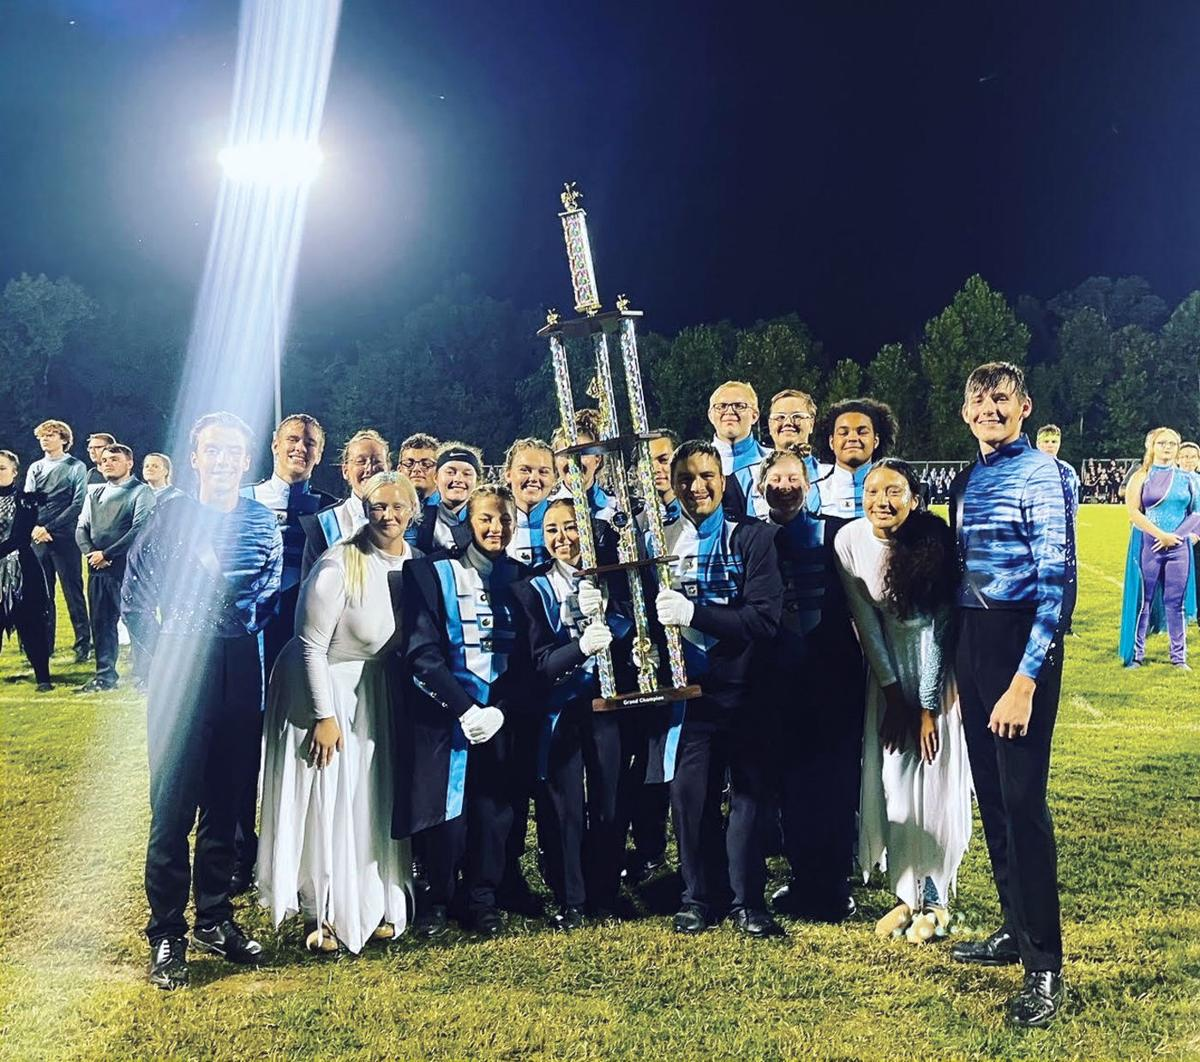 School bands return with regular season after COVID delays